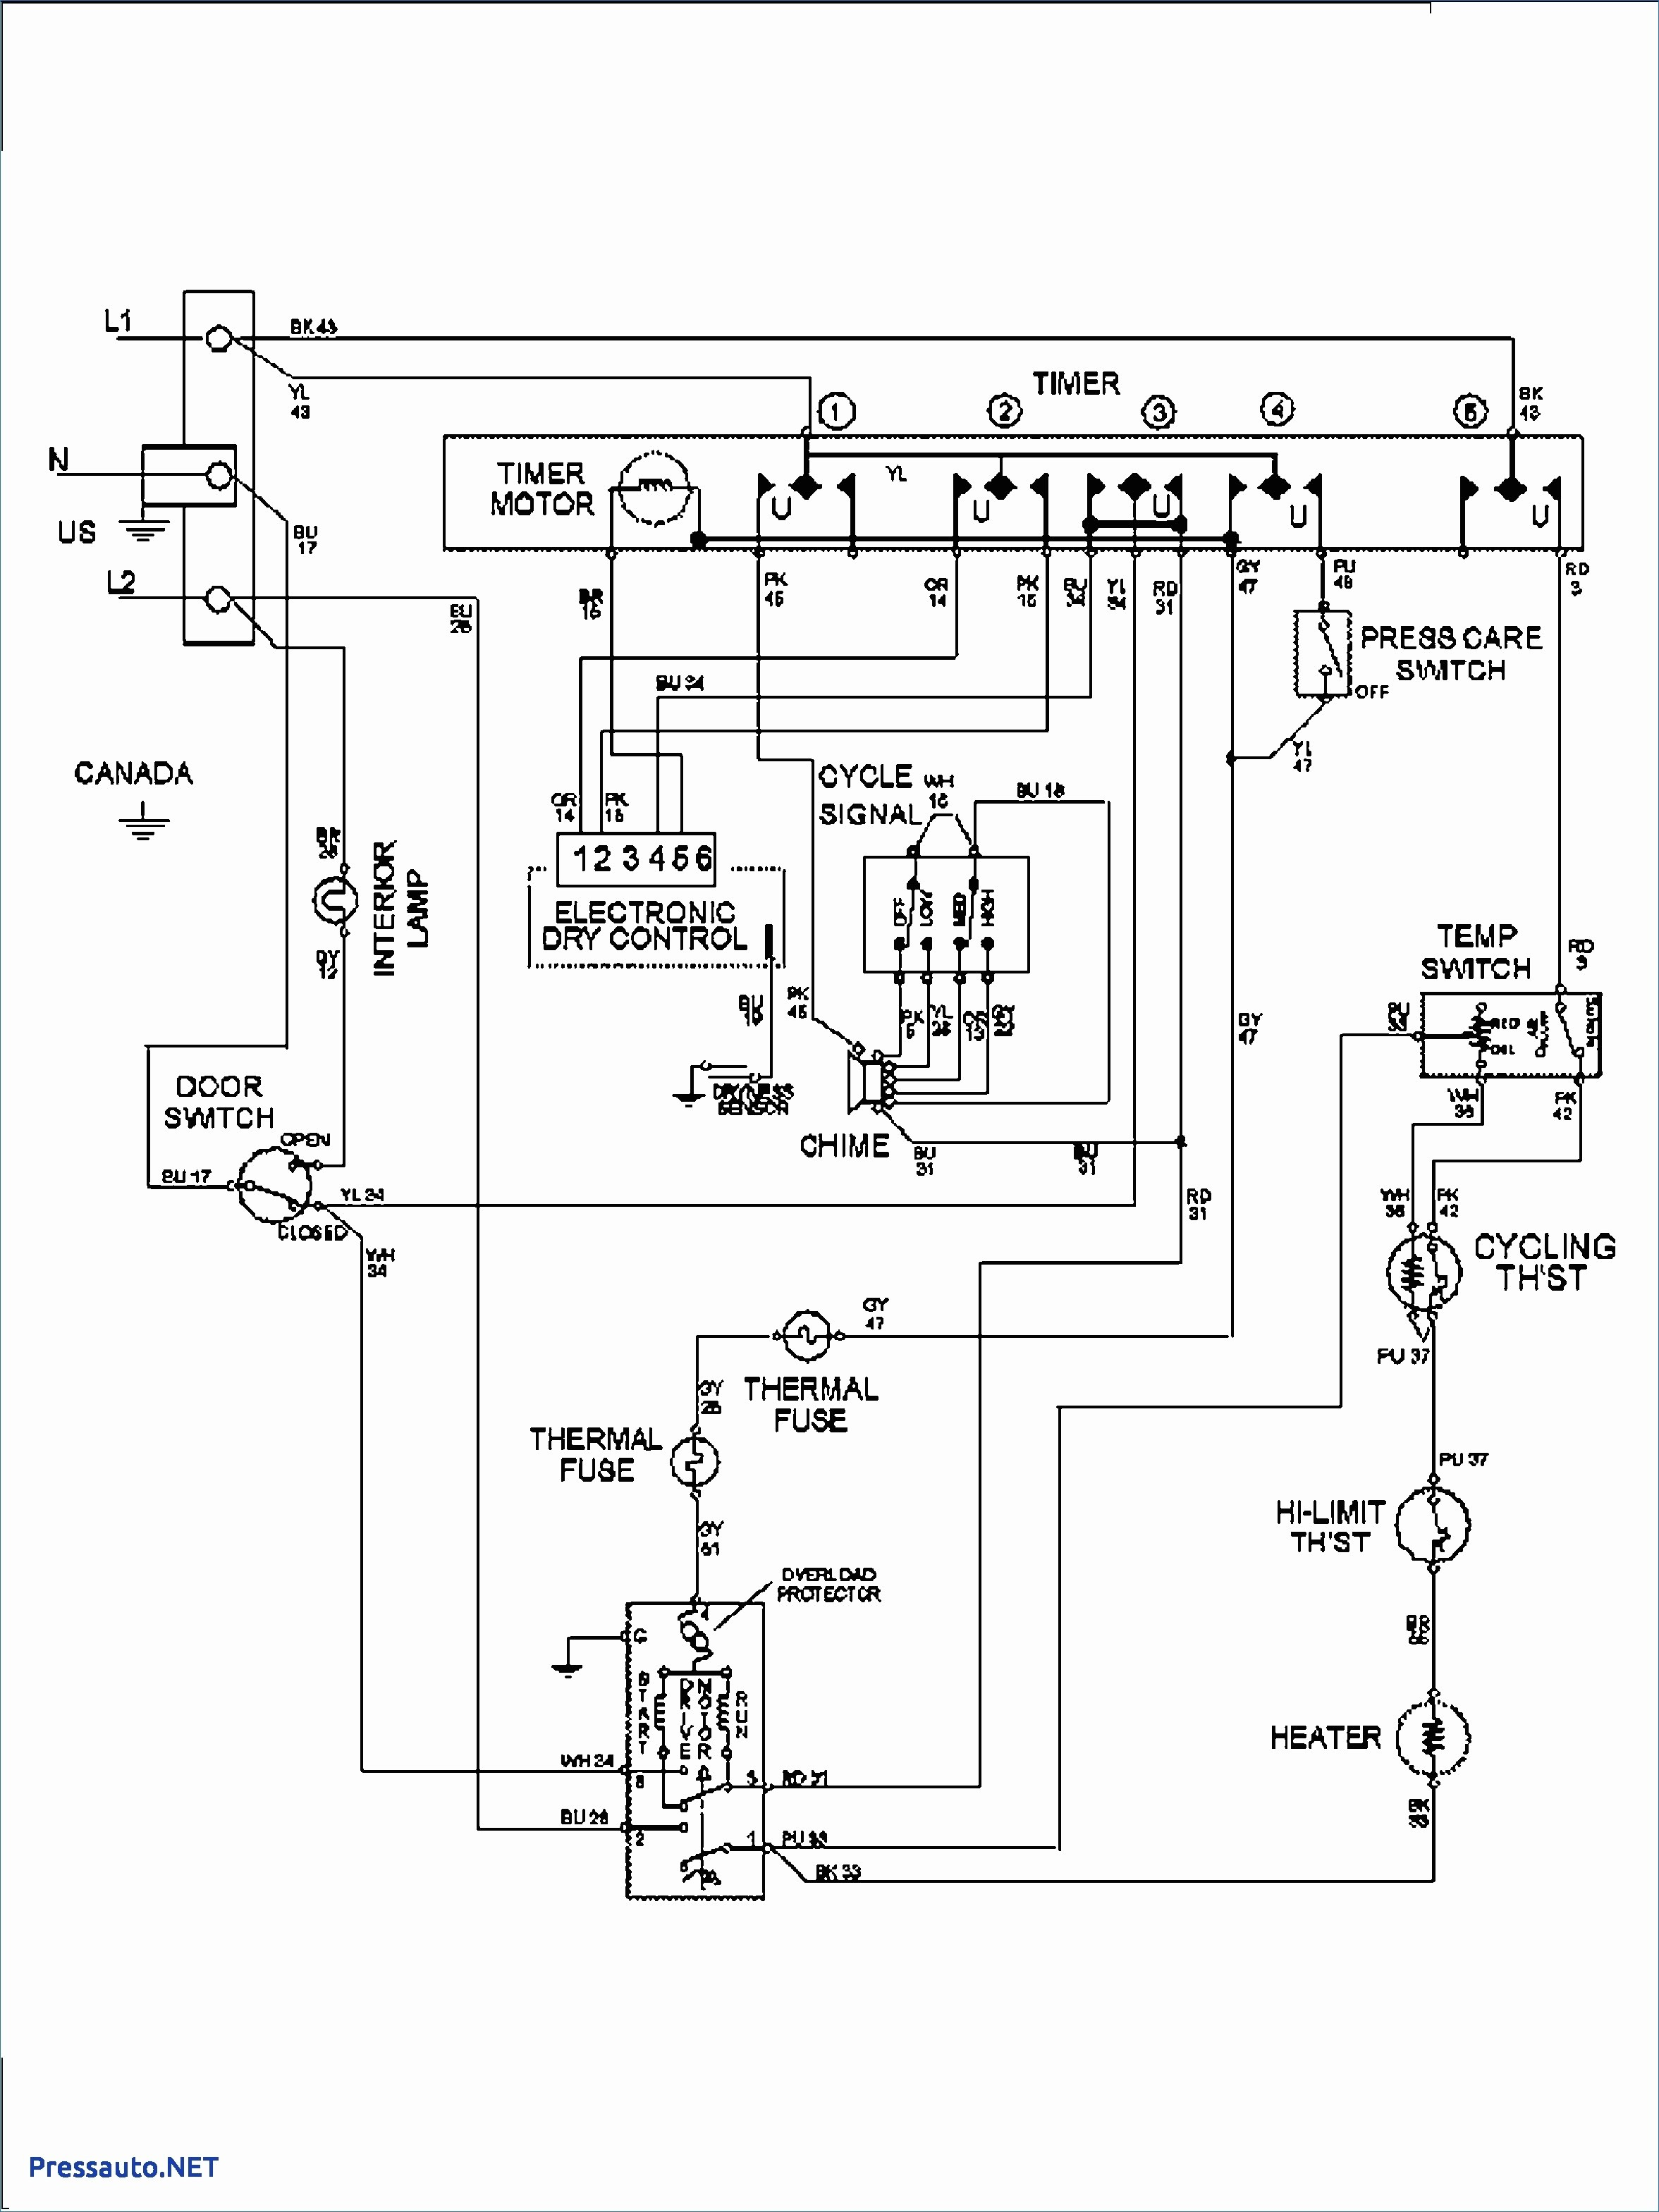 Full Size of Wiring Diagram Whirlpool Estate Dryer Wiring Diagram Lovely Whirlpool Refrigerator Wiring Diagram